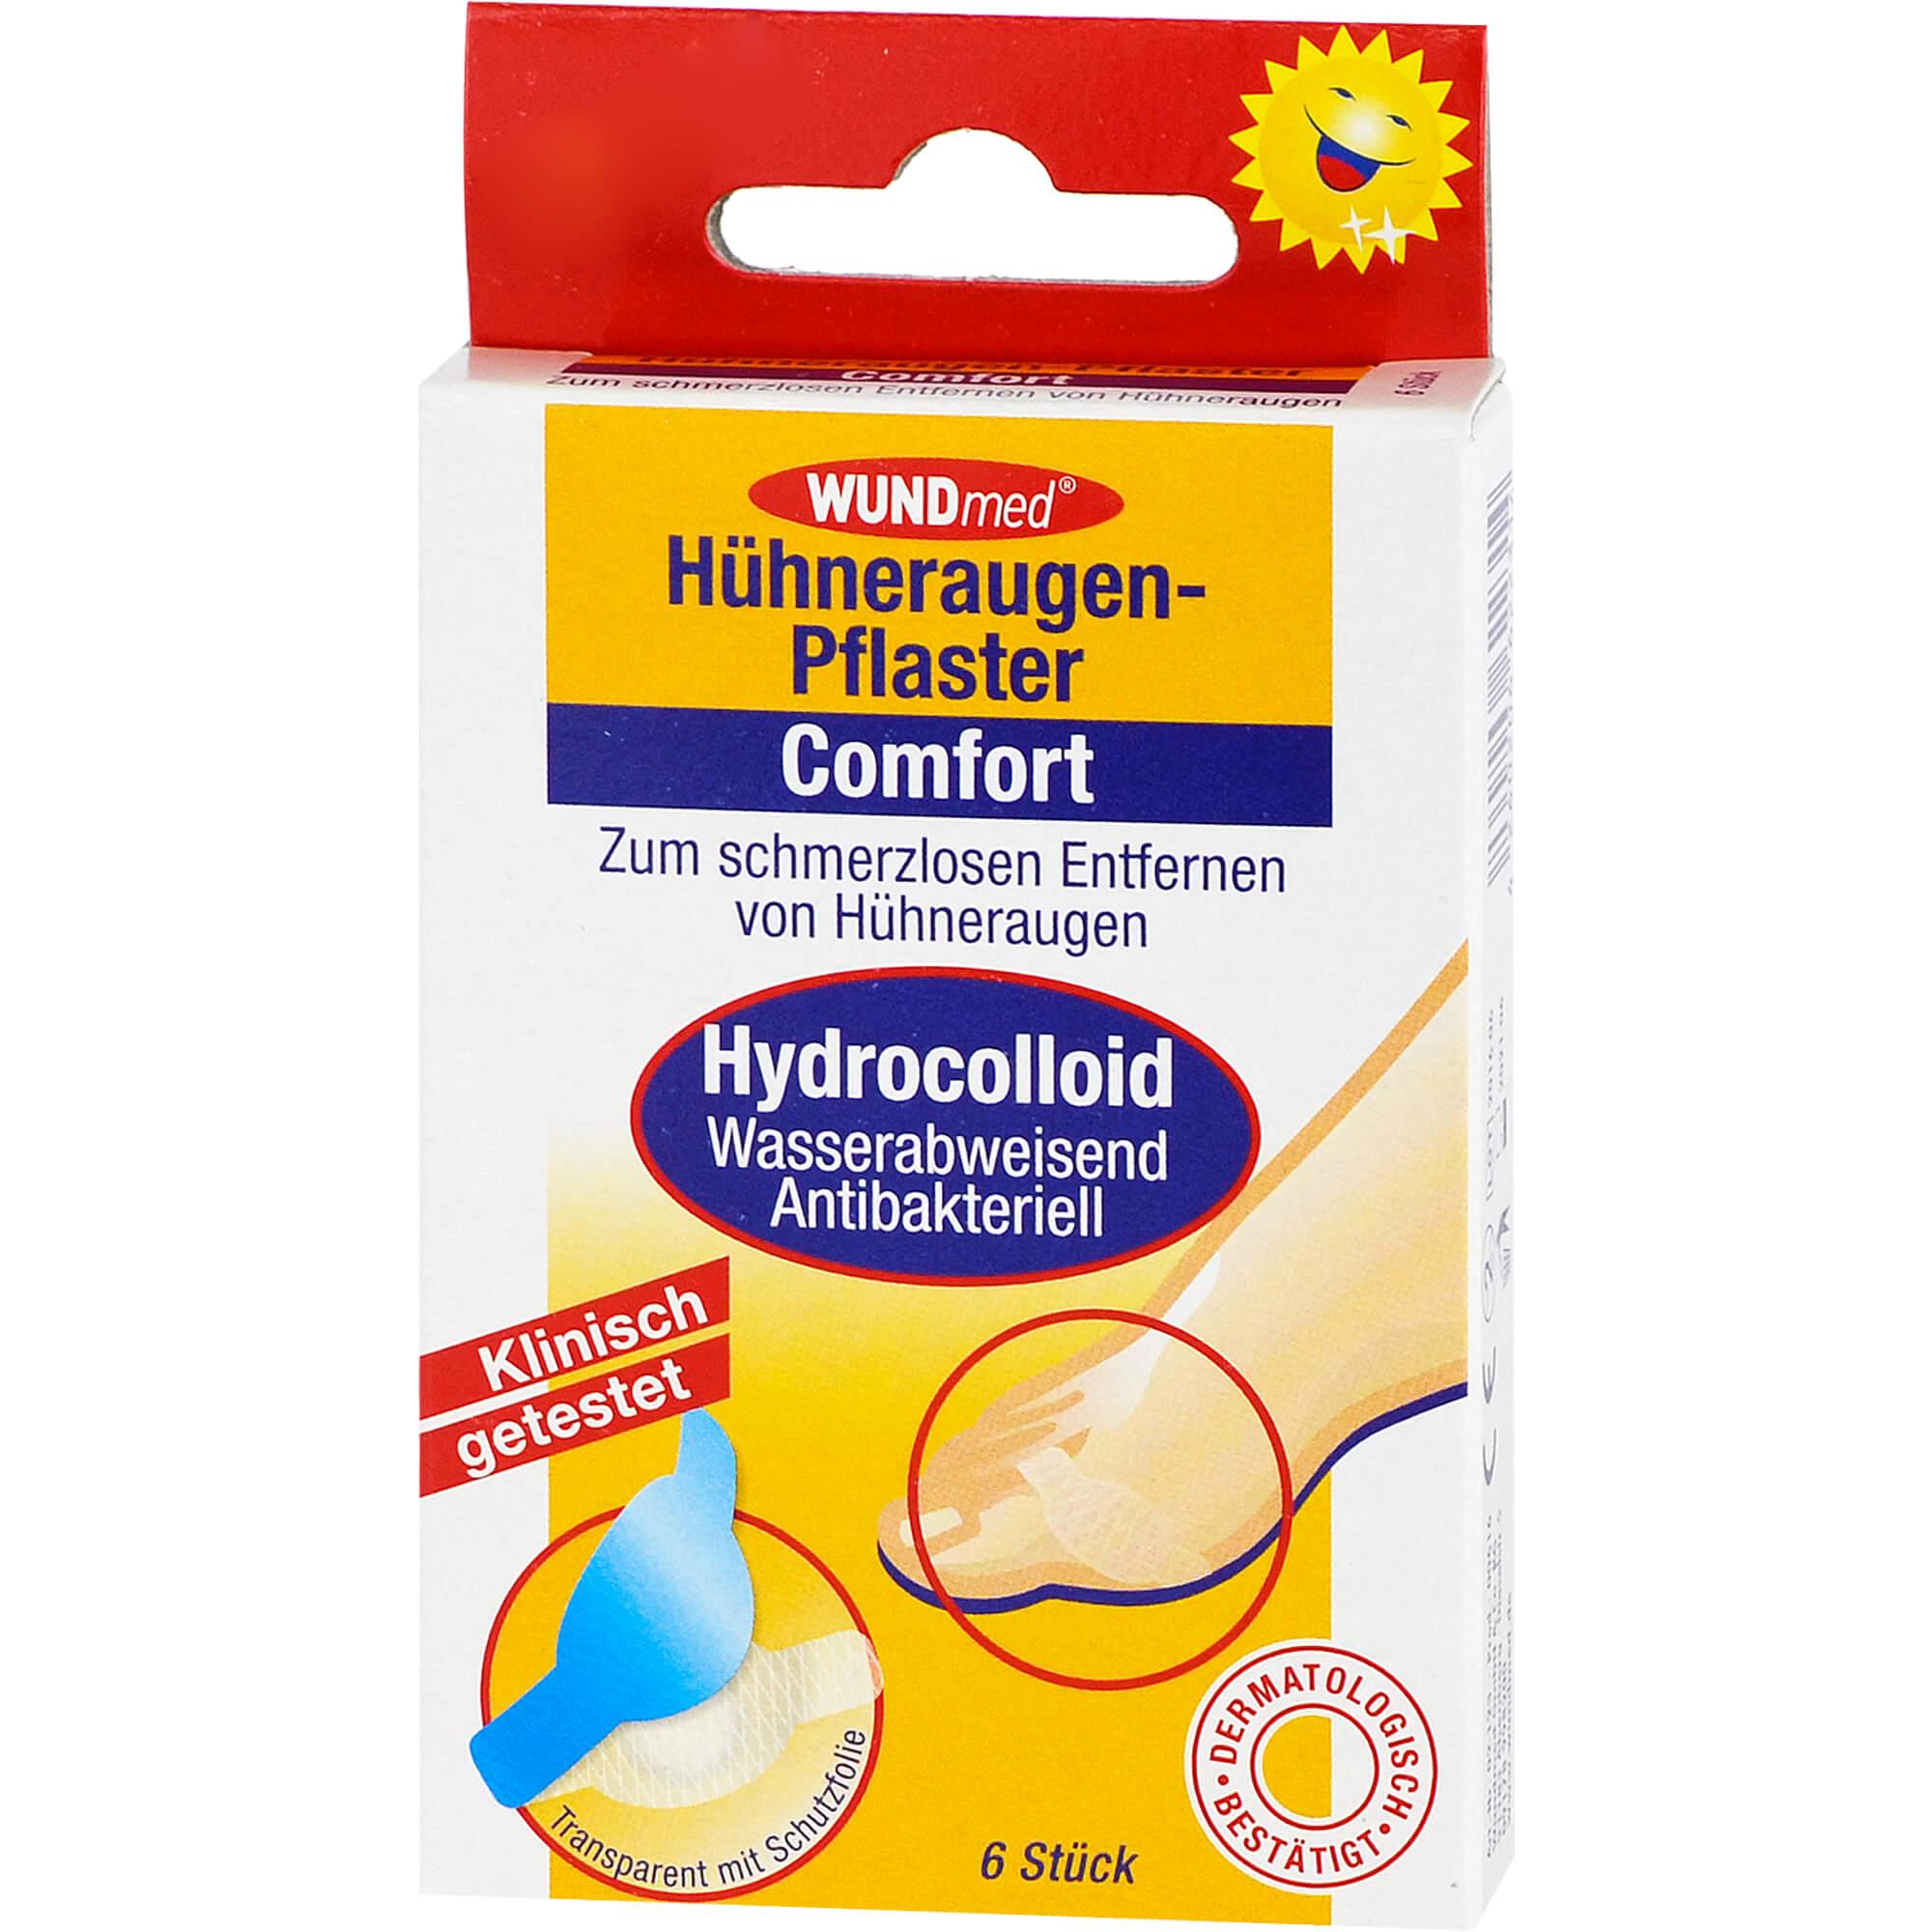 Hühneraugenpflaster Comfort hydrocolloid